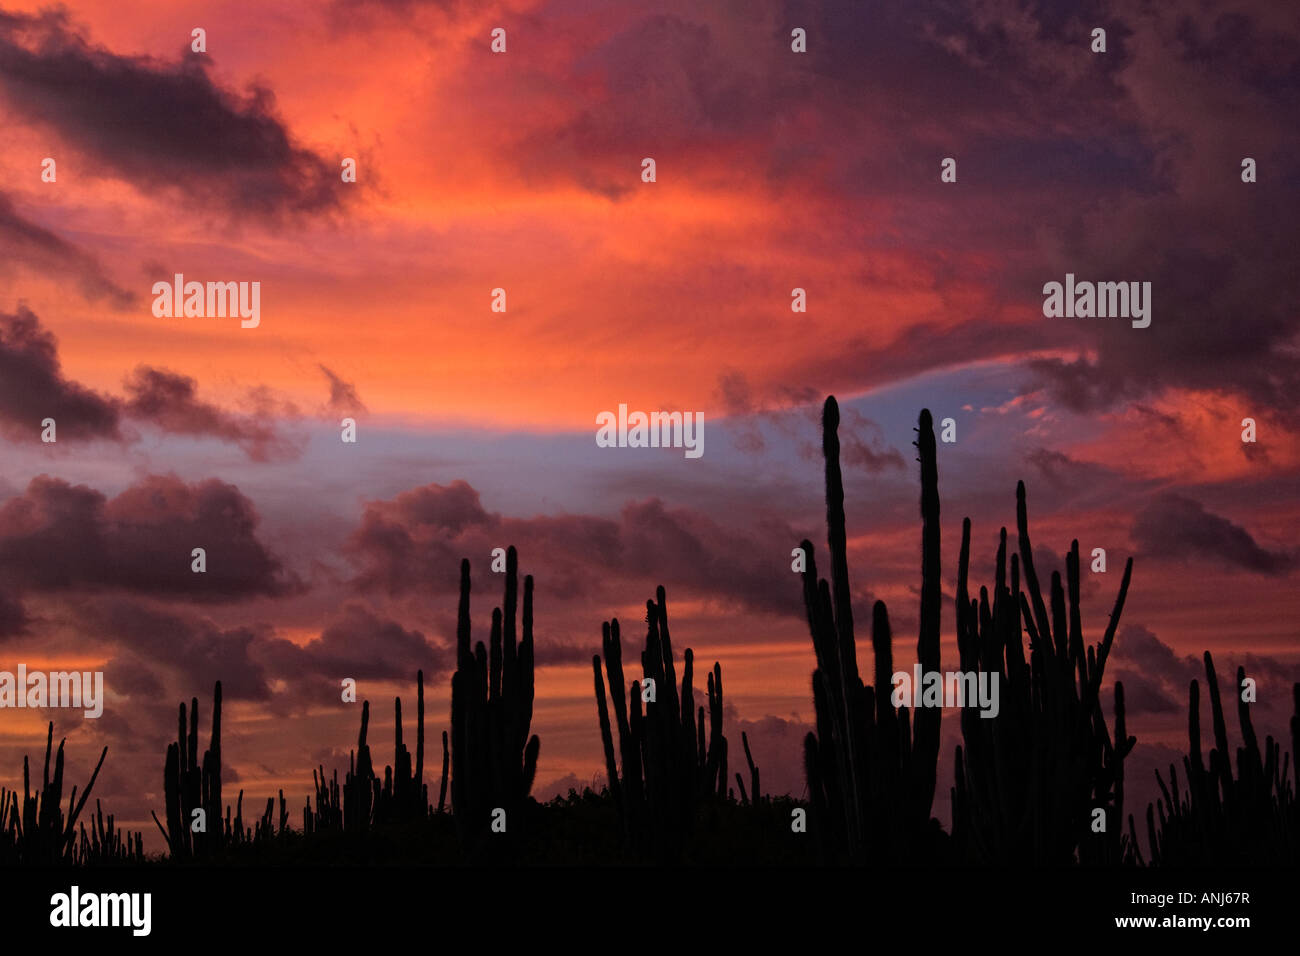 Beautiful warm glow sunset with cactus - Stock Image